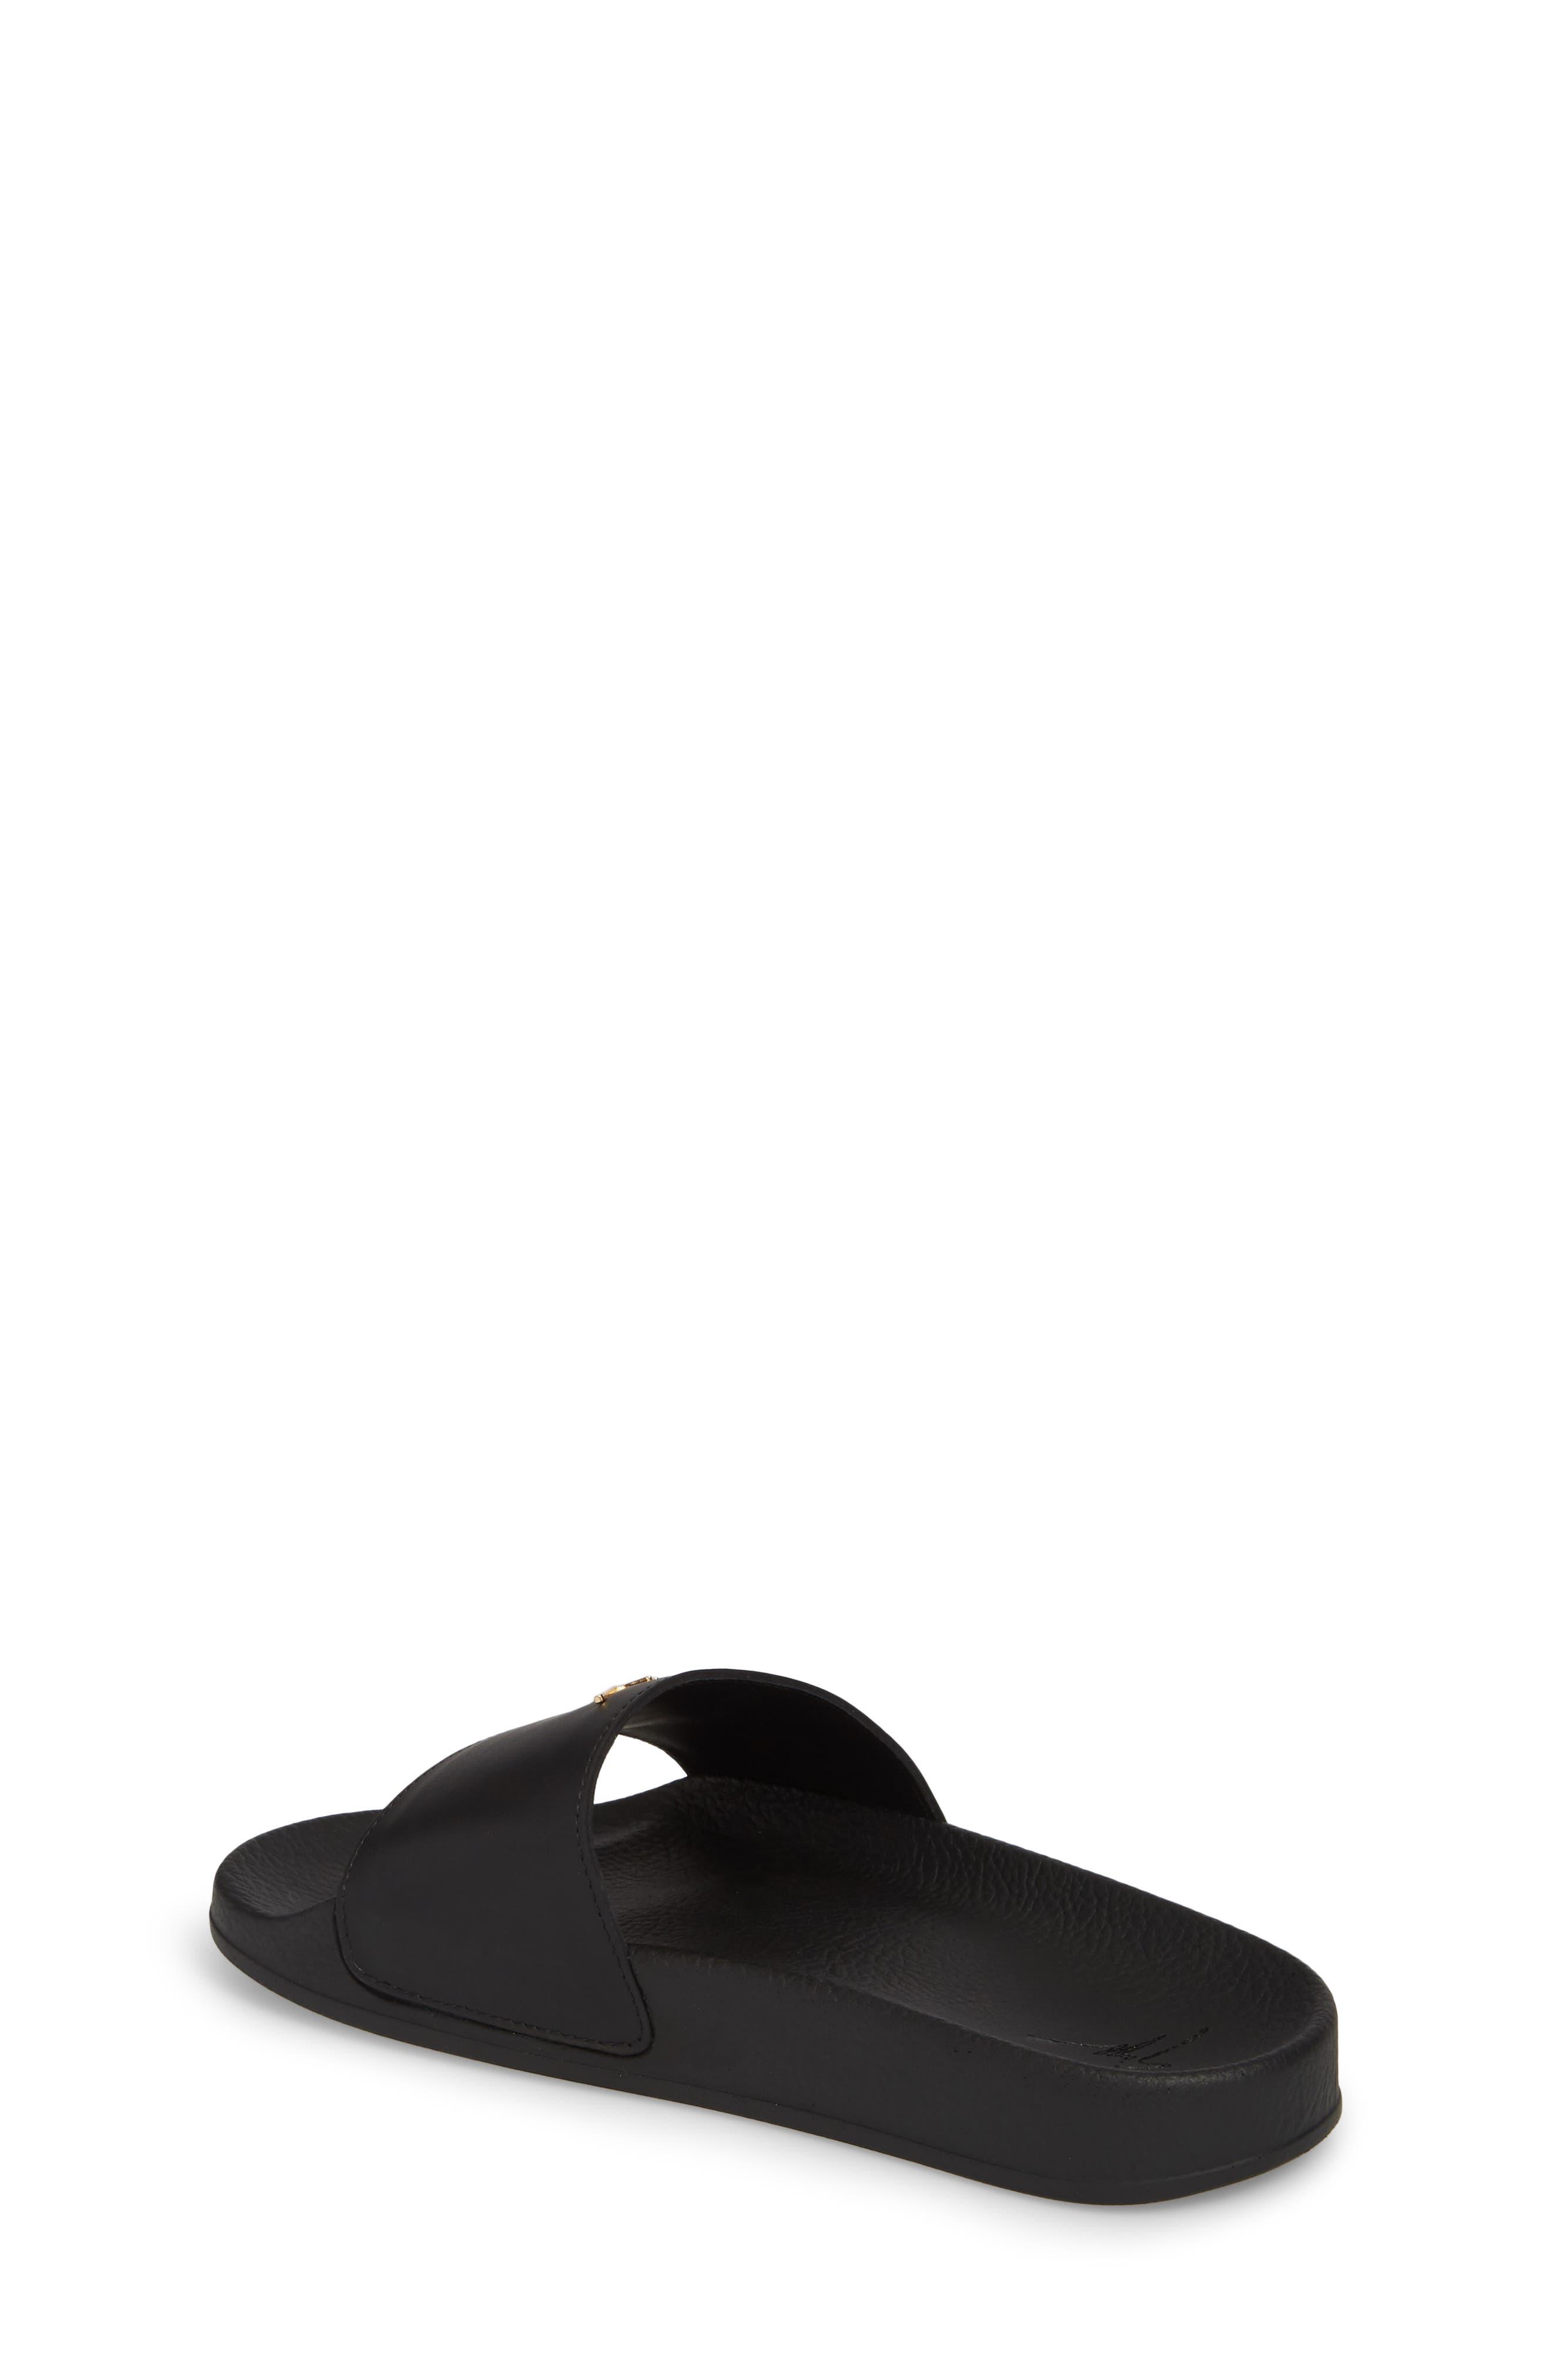 Birel Slide Sandal,                             Alternate thumbnail 2, color,                             Black Leather